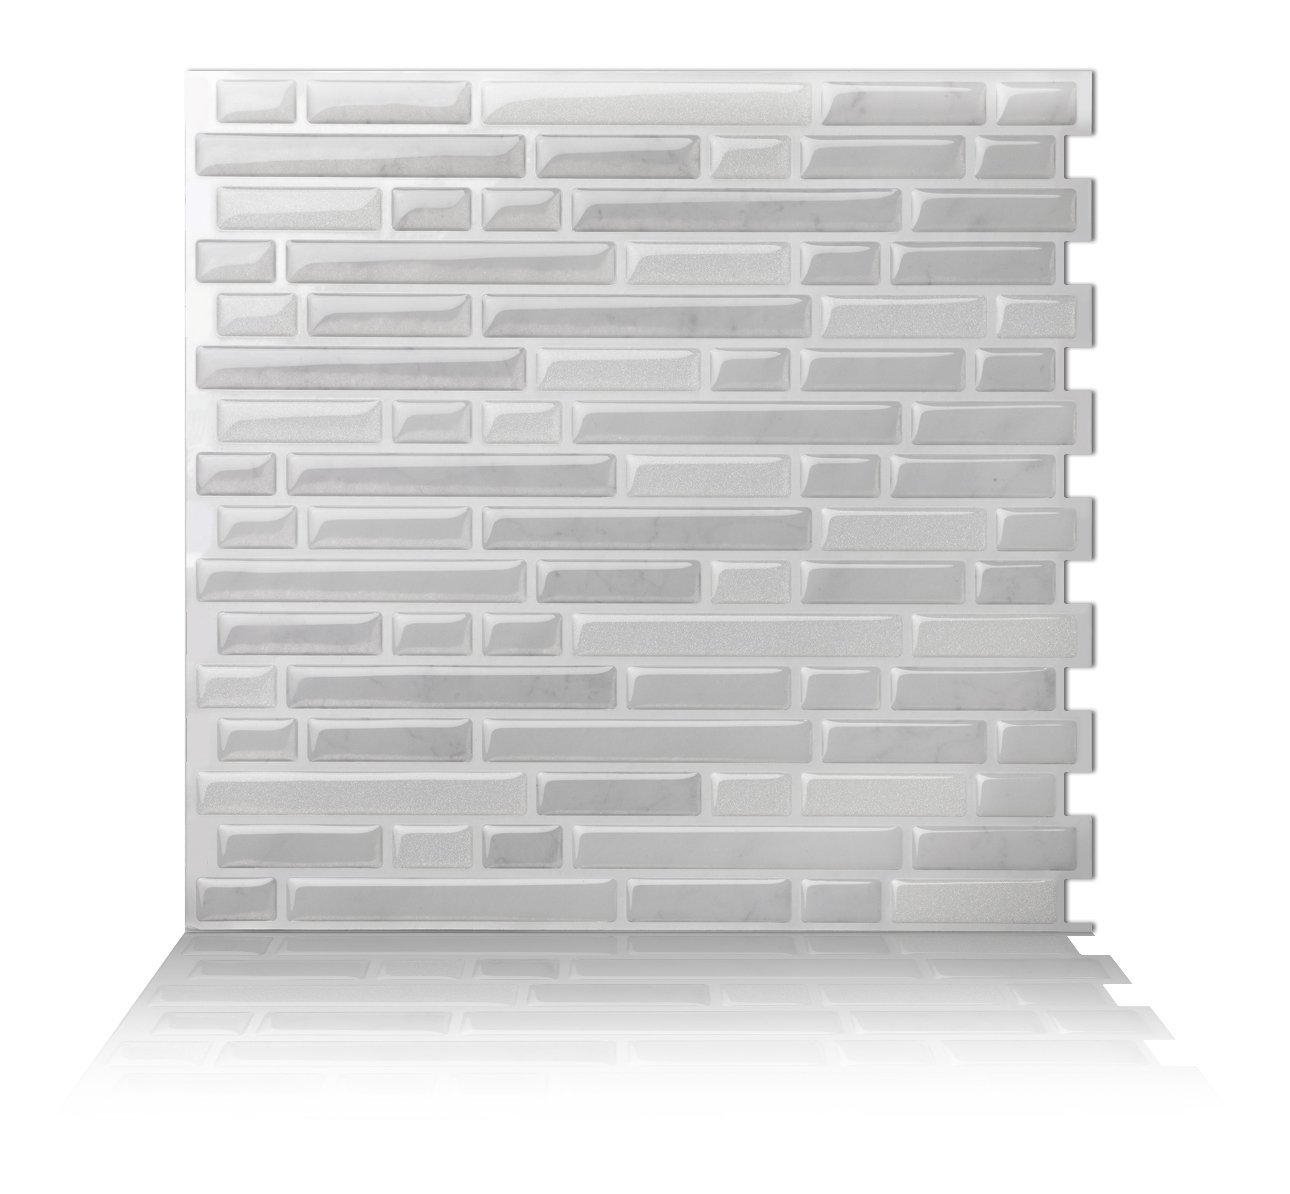 Tic Tac Tiles - Premium Anti Mold Peel and Stick Wall Tile Backsplash in Como White